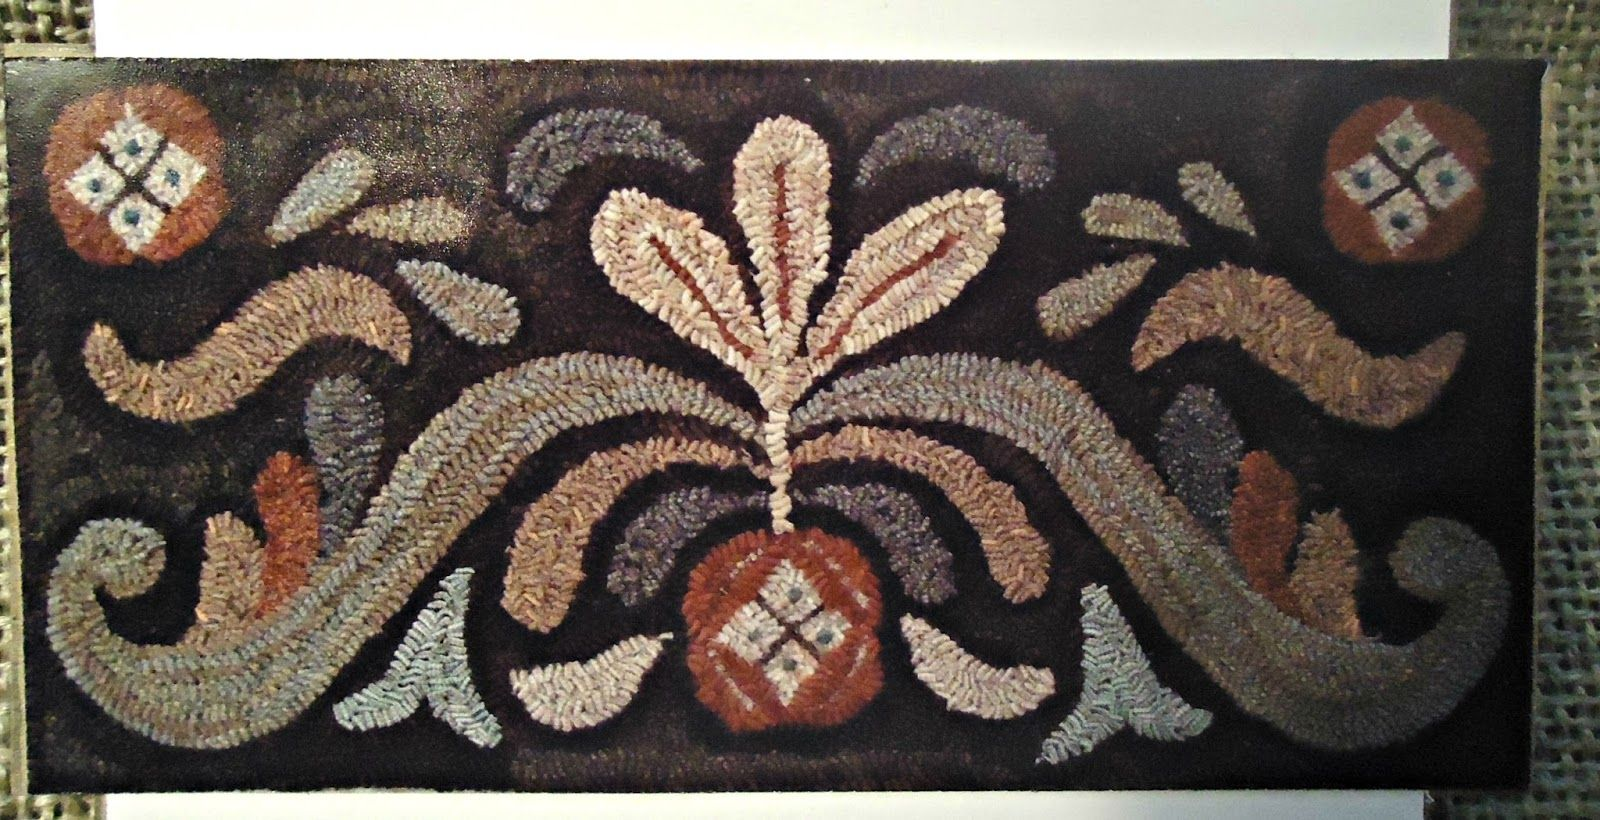 Pin von Kristin Privetts auf Needle and Thread- Eclectic Junkie ...